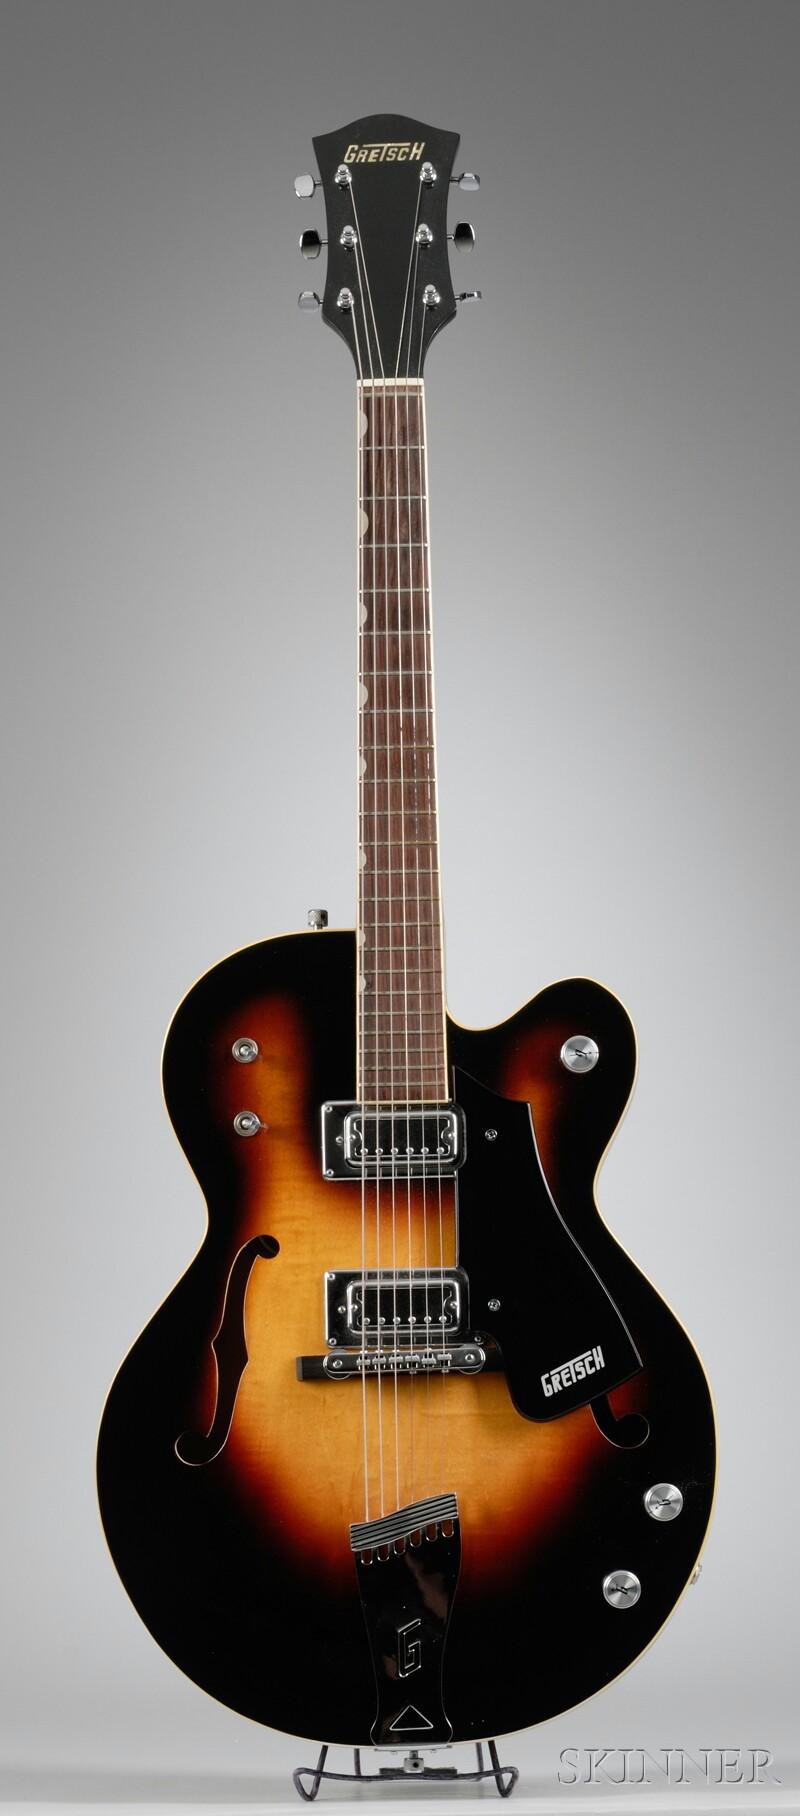 American Guitar, Gretsch Company, Brooklyn, 1972, Anniversary Model 7560